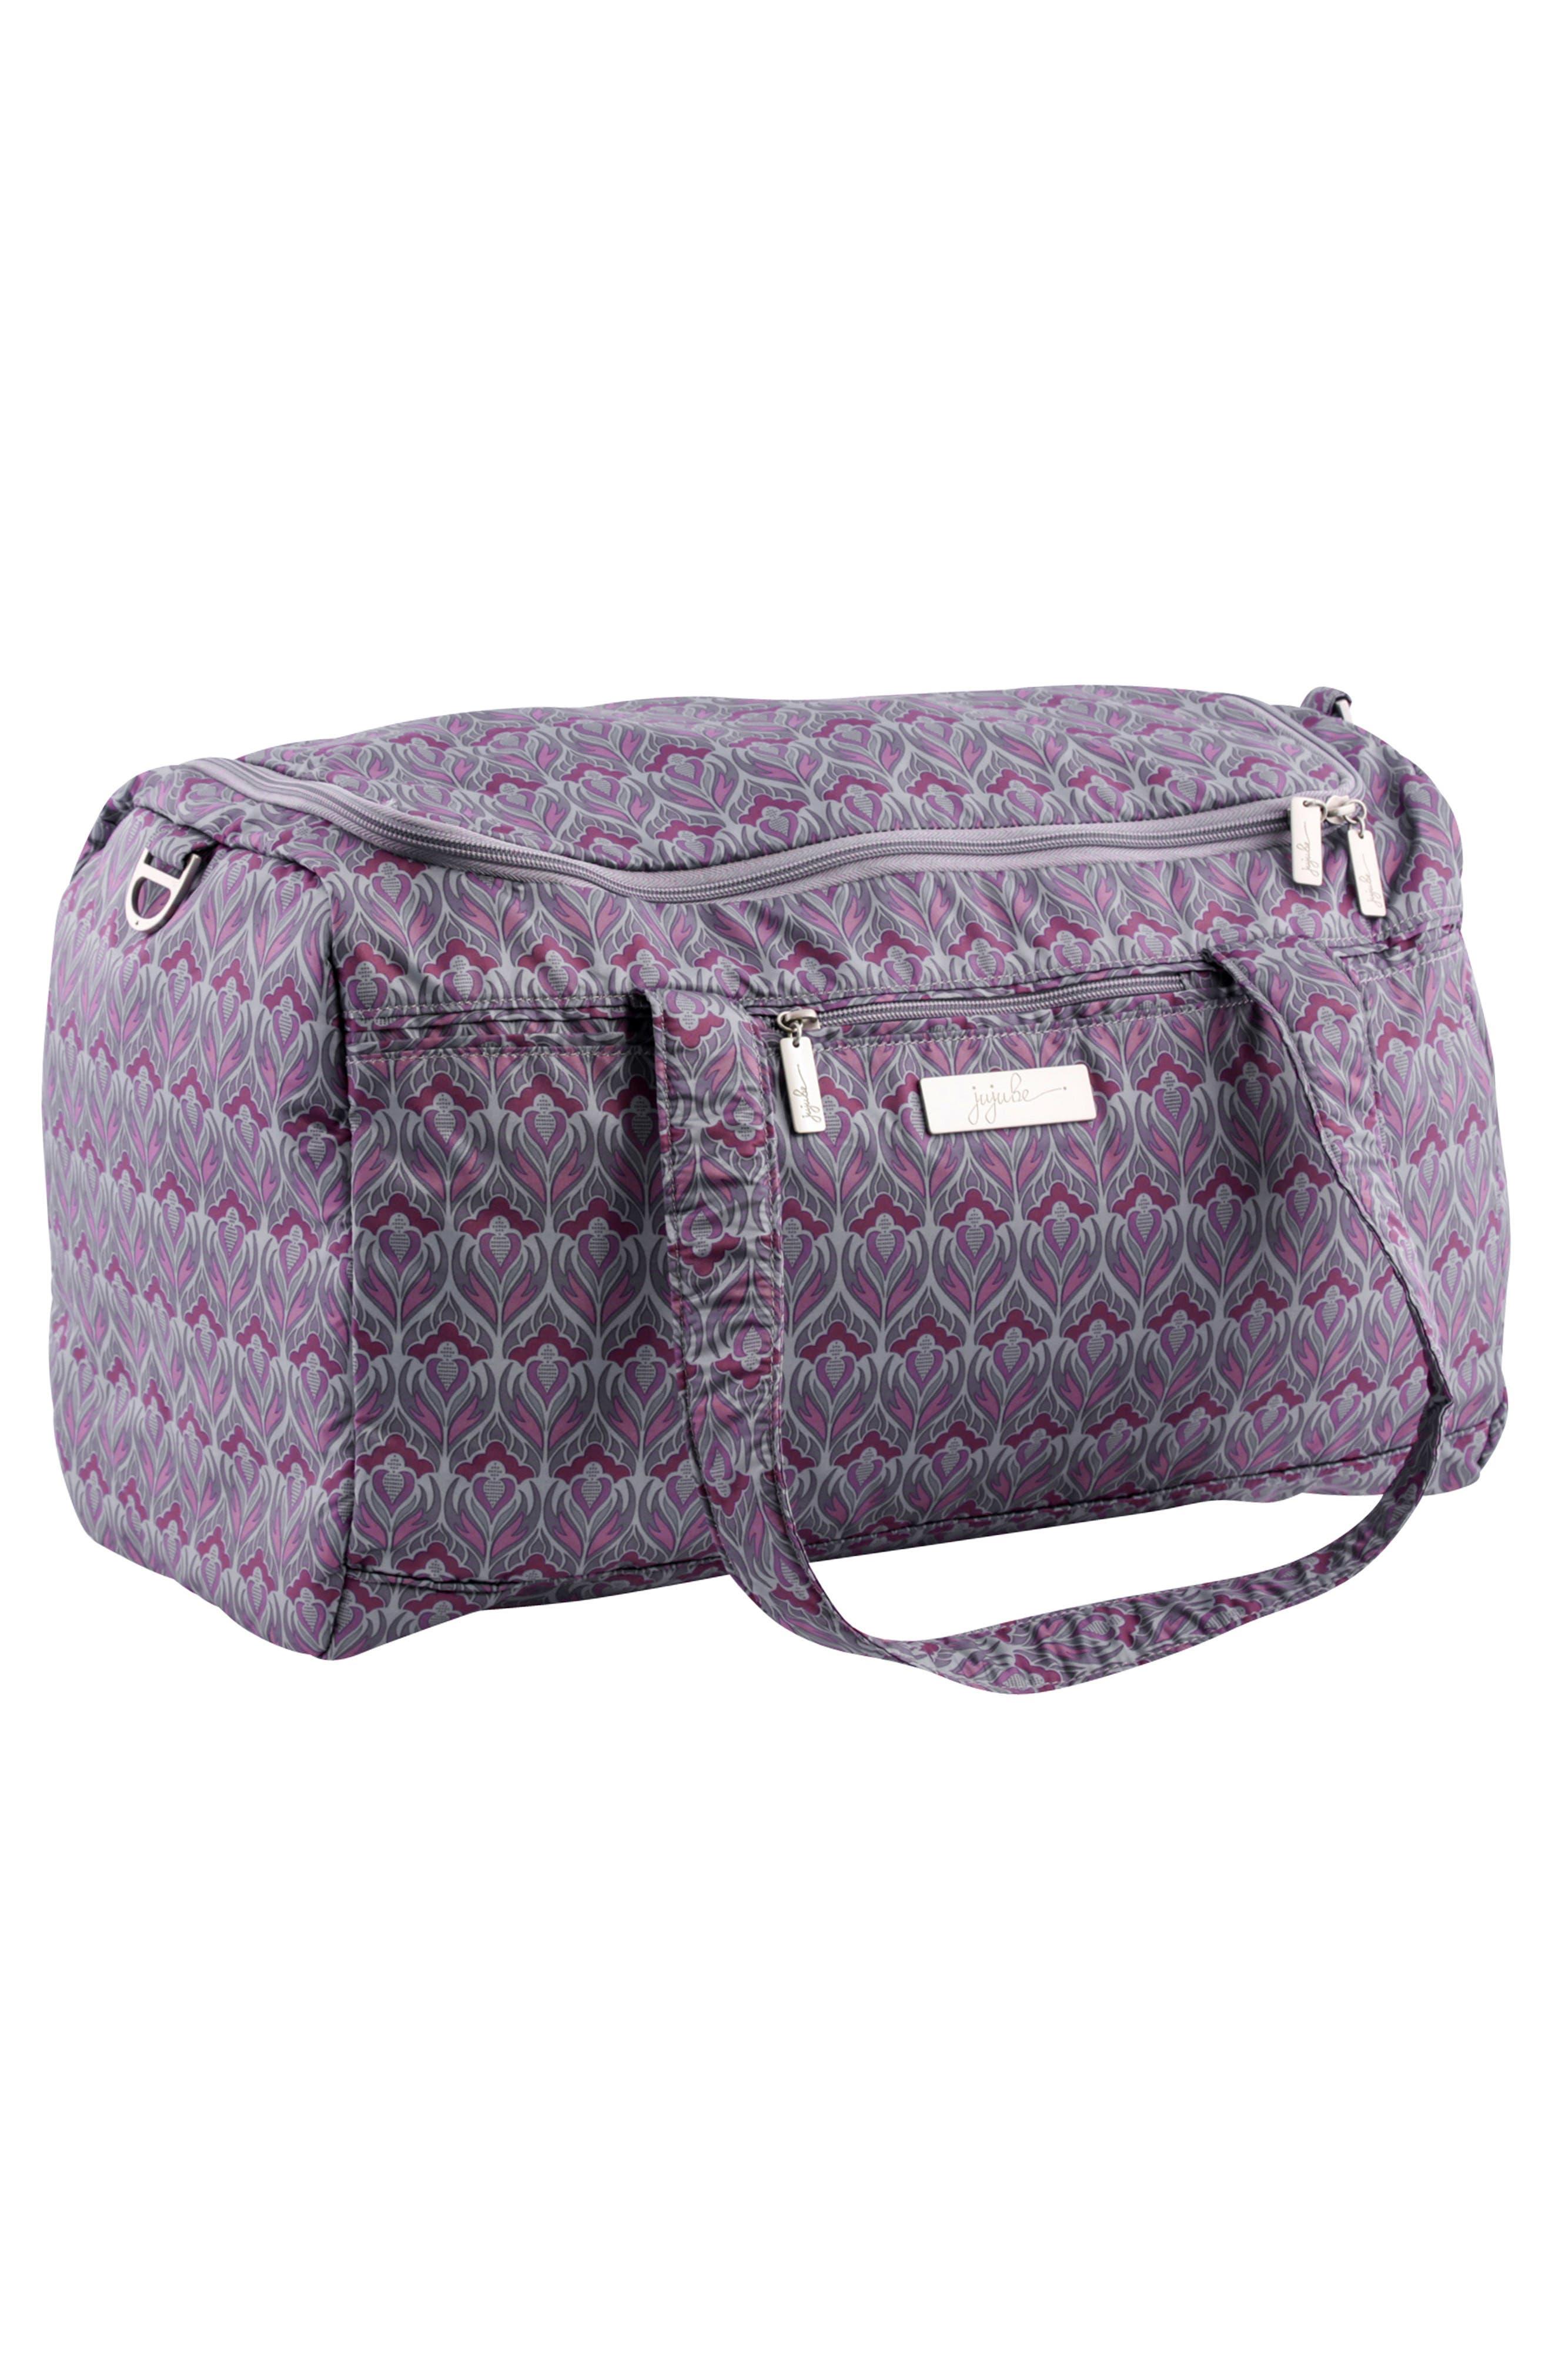 'Starlet' Travel Diaper Bag,                             Alternate thumbnail 3, color,                             Amethyst Ice